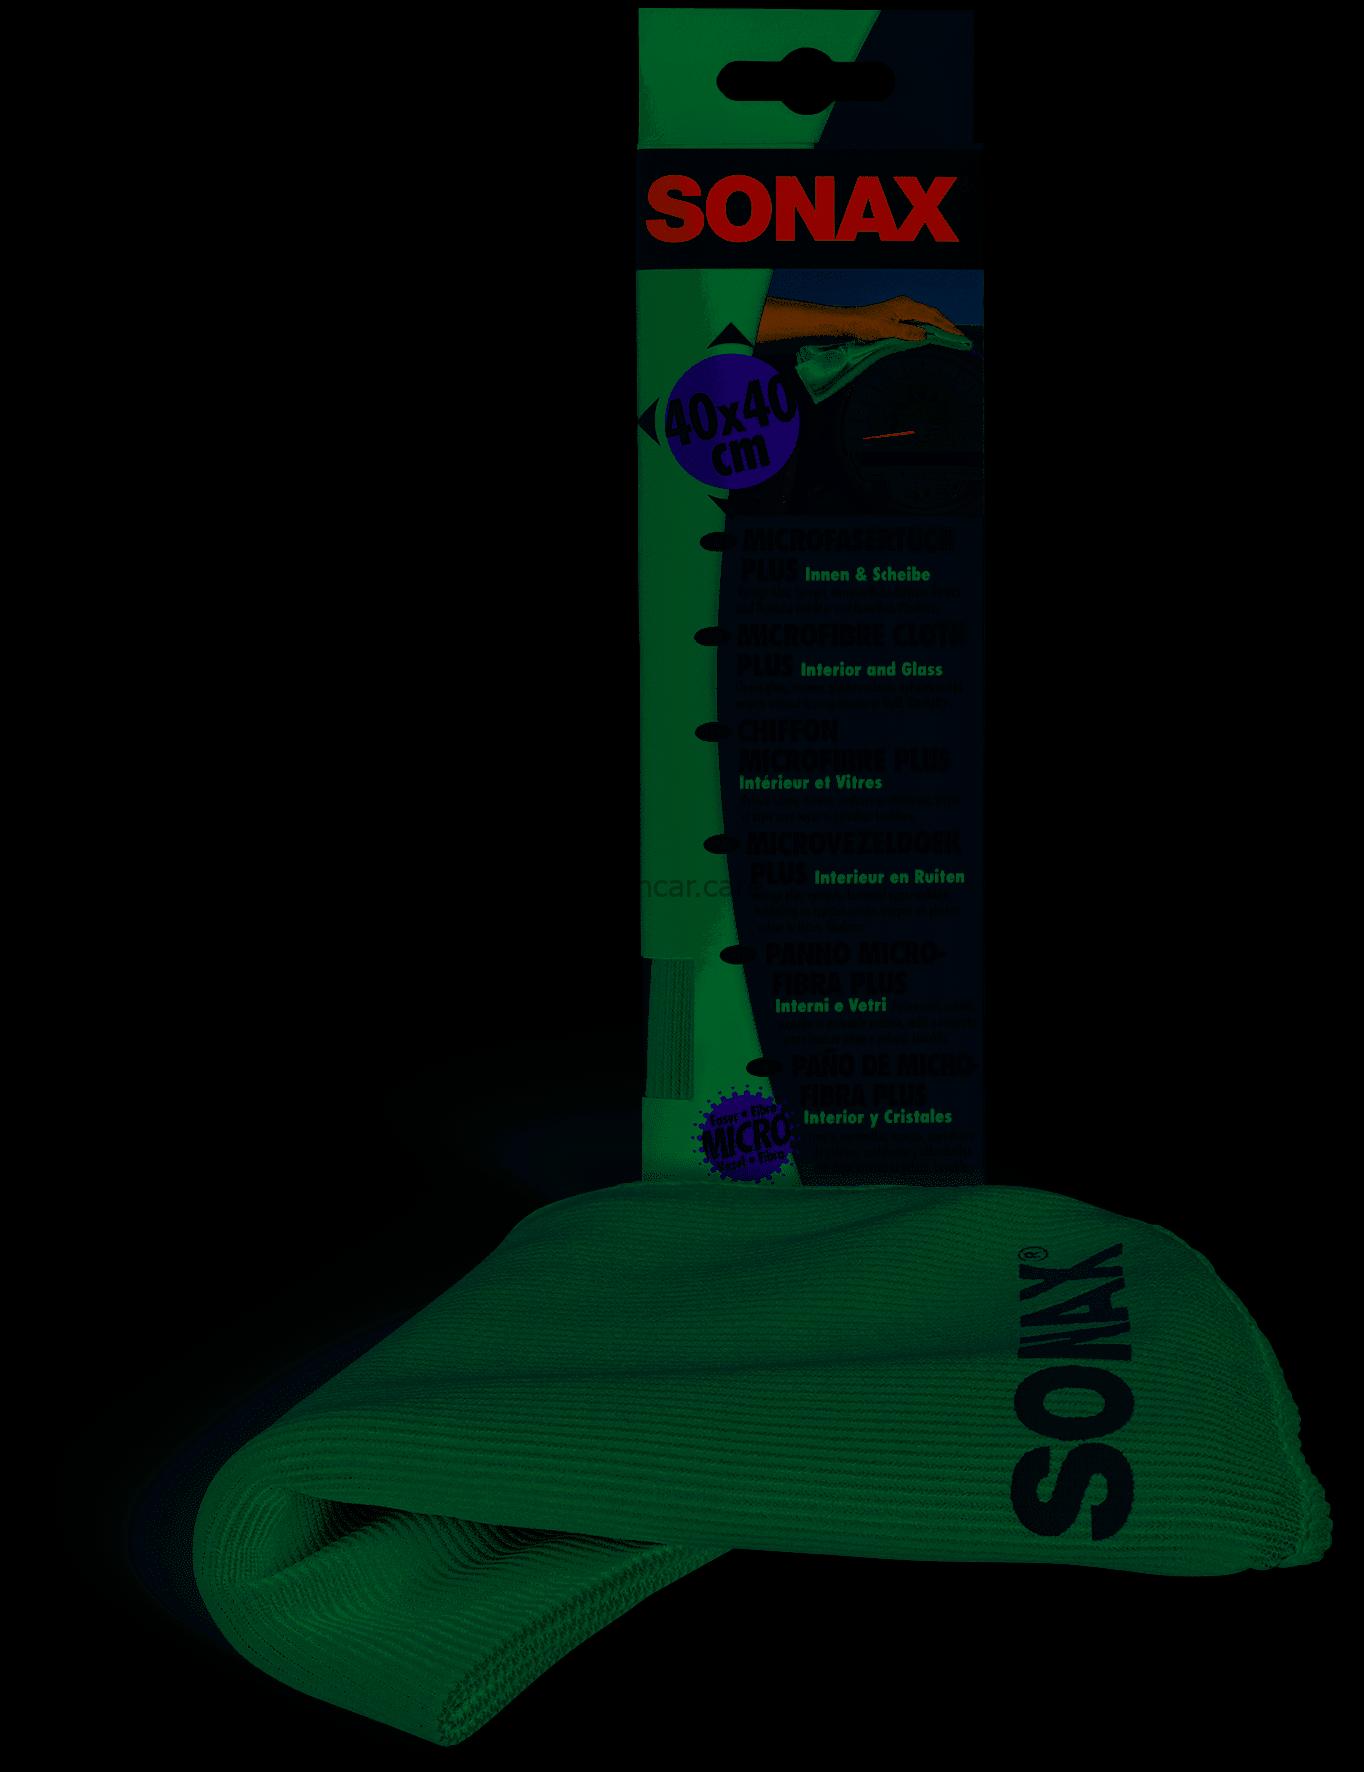 دستمال مايکروفايبر پلاس سوناکس SONAX 416541